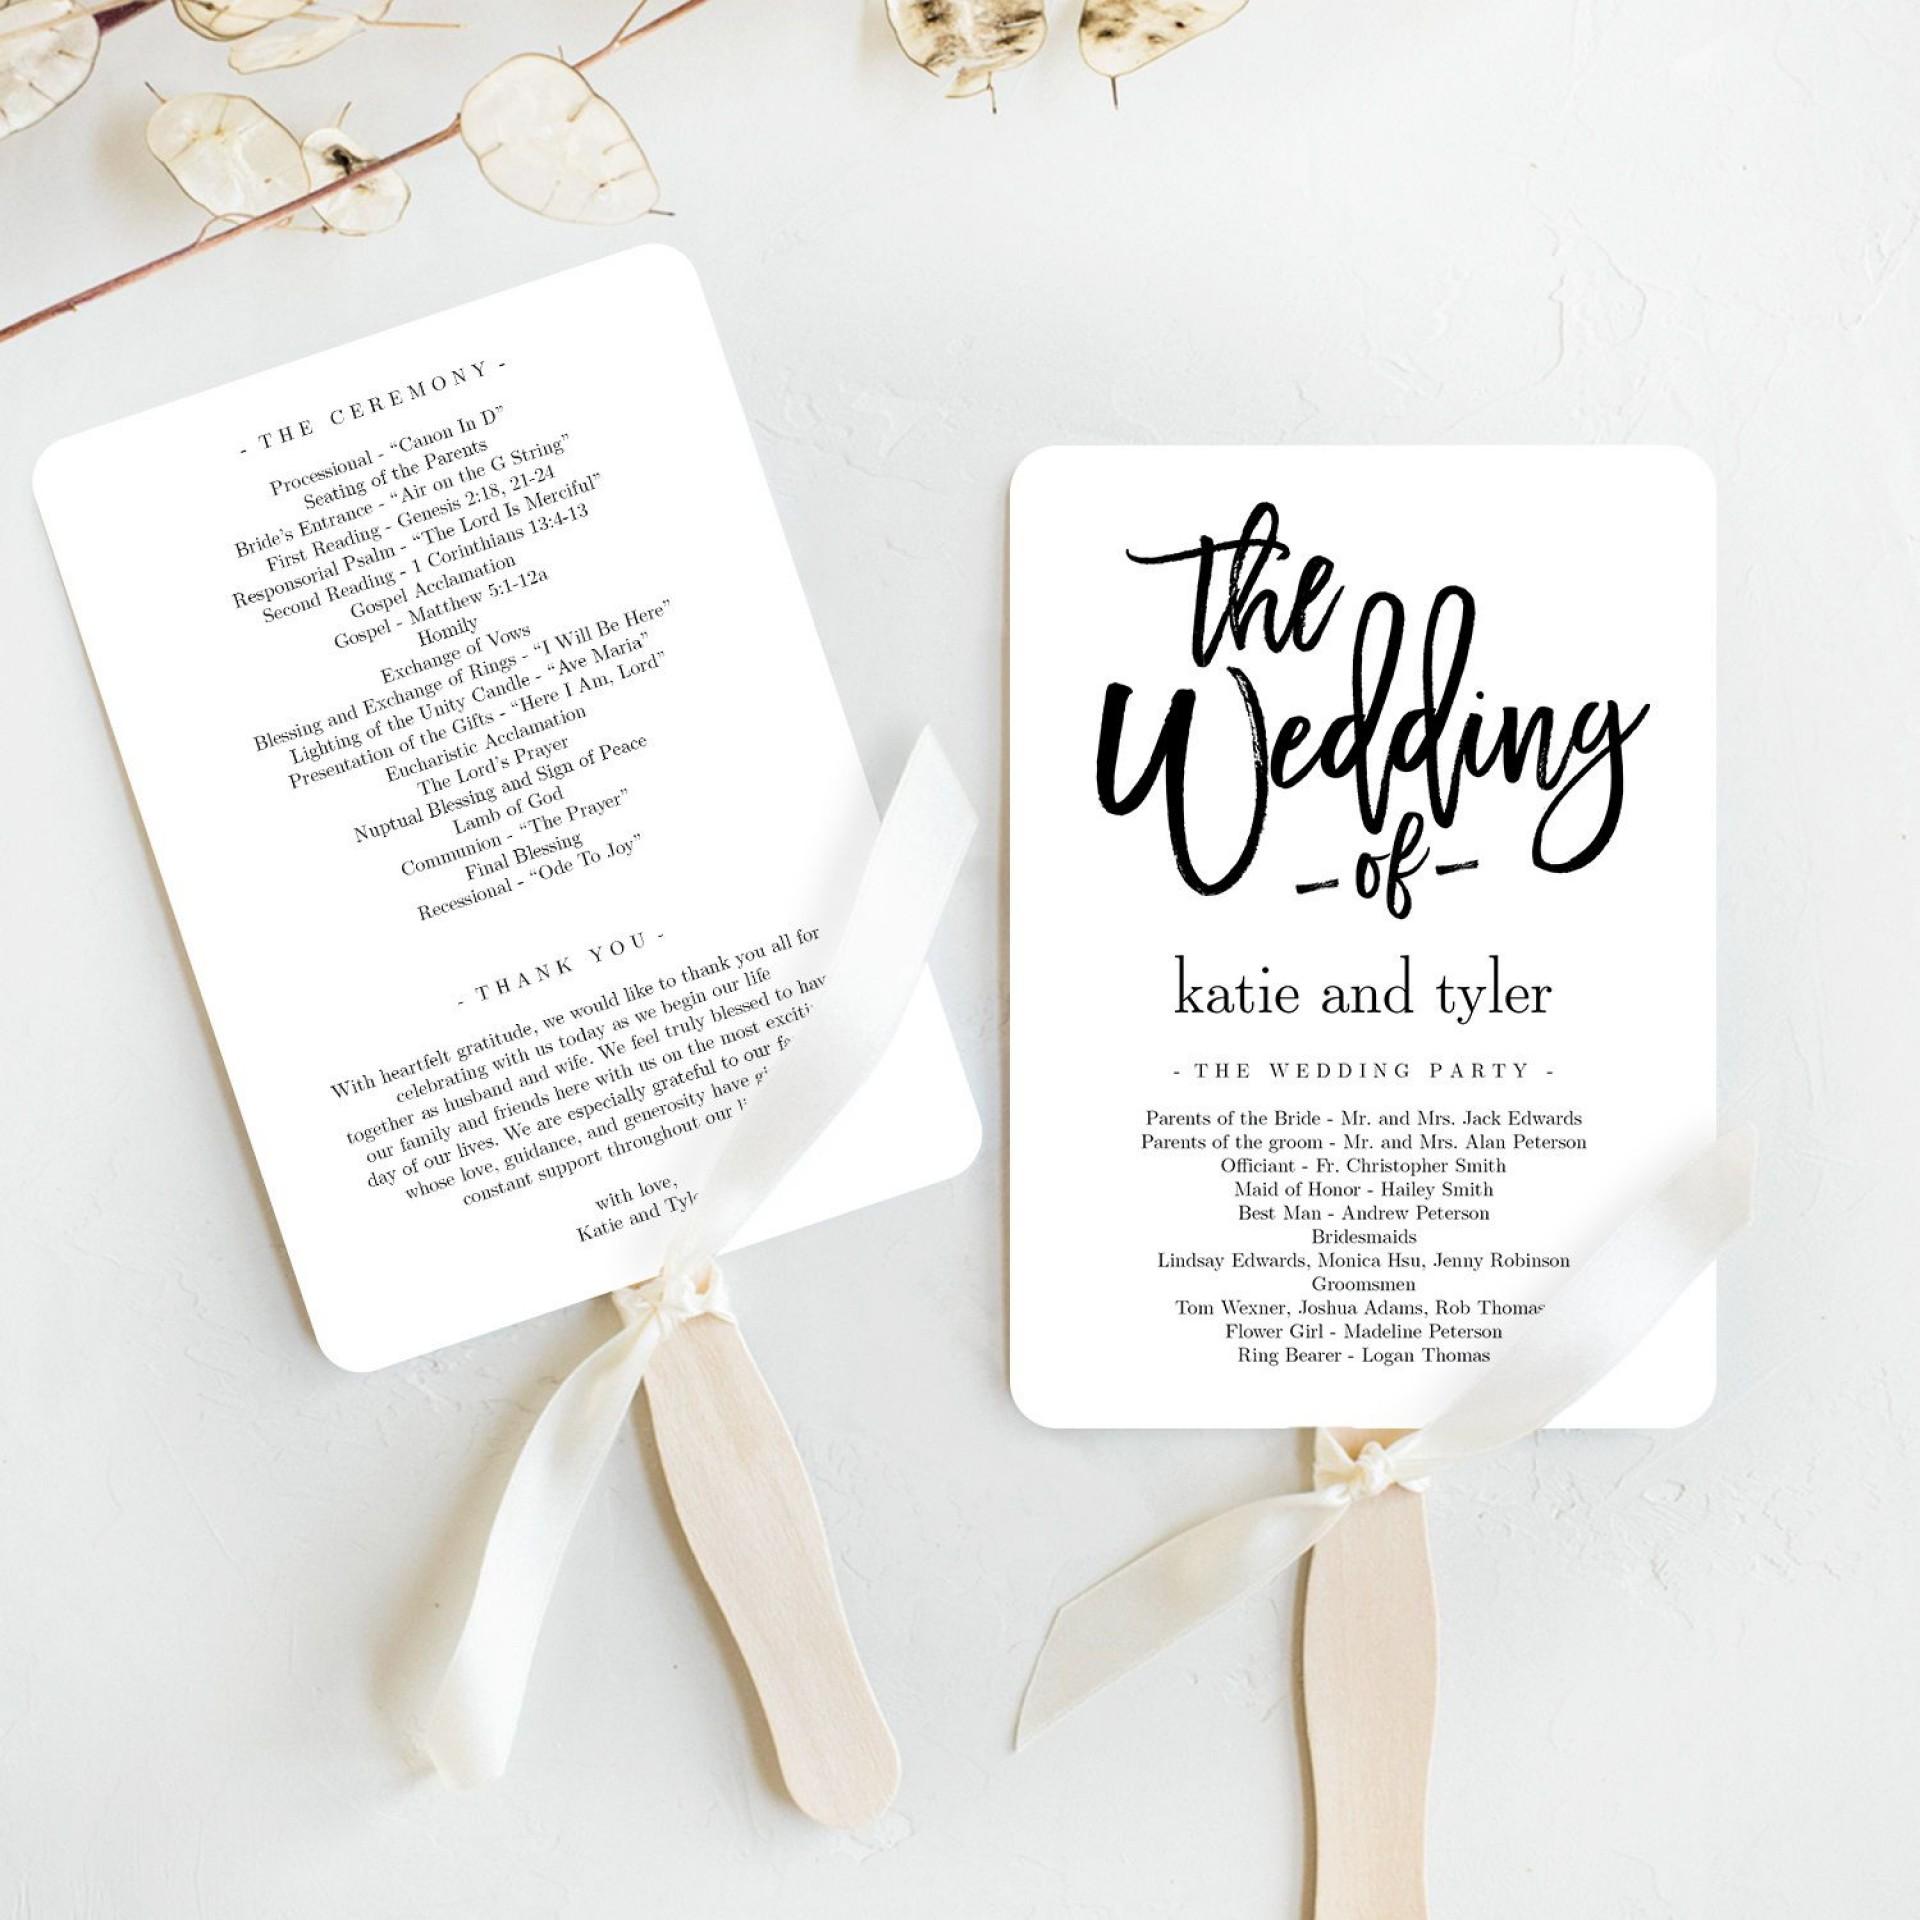 004 Fantastic Template For Wedding Program High Def  Word Free Catholic1920